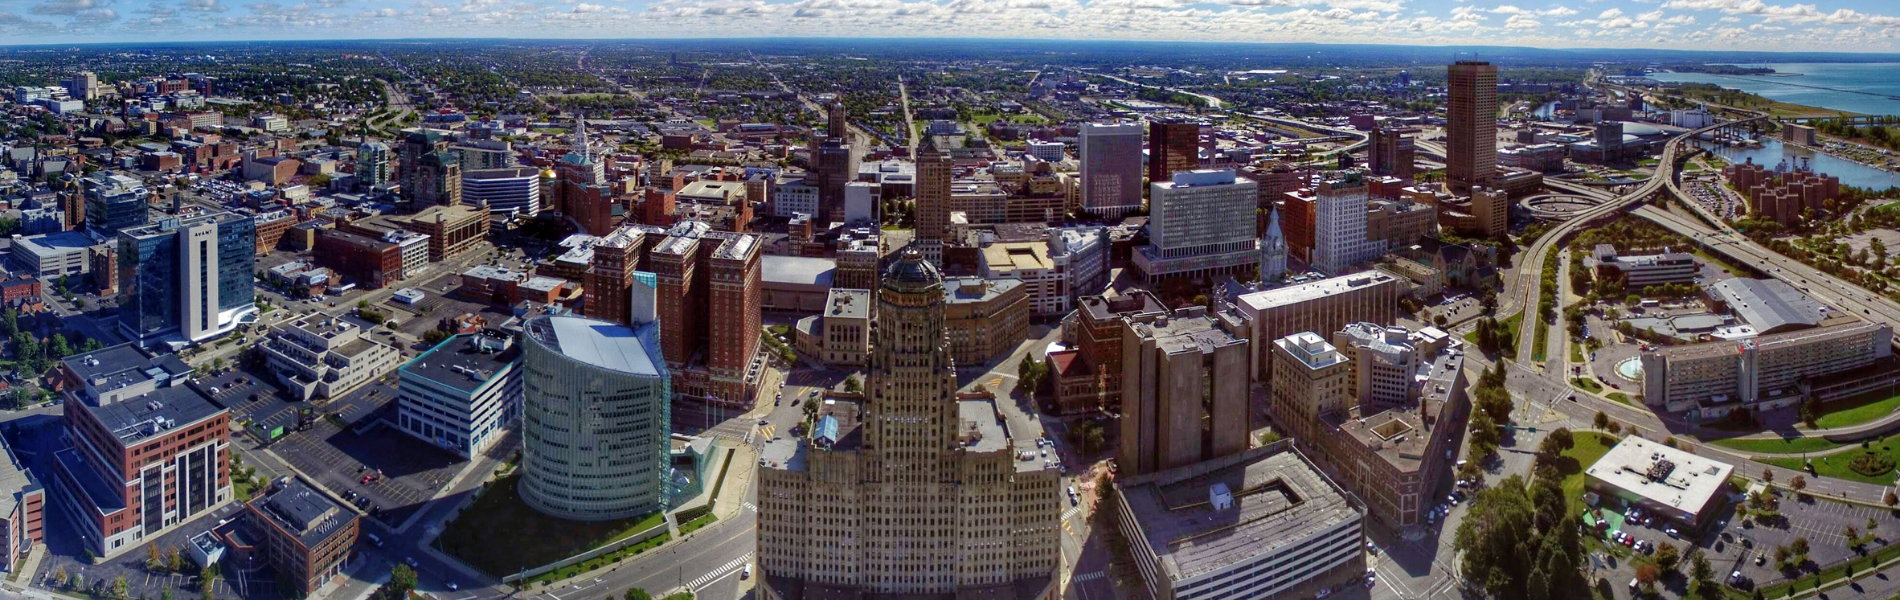 Downtown Buffalo wide image